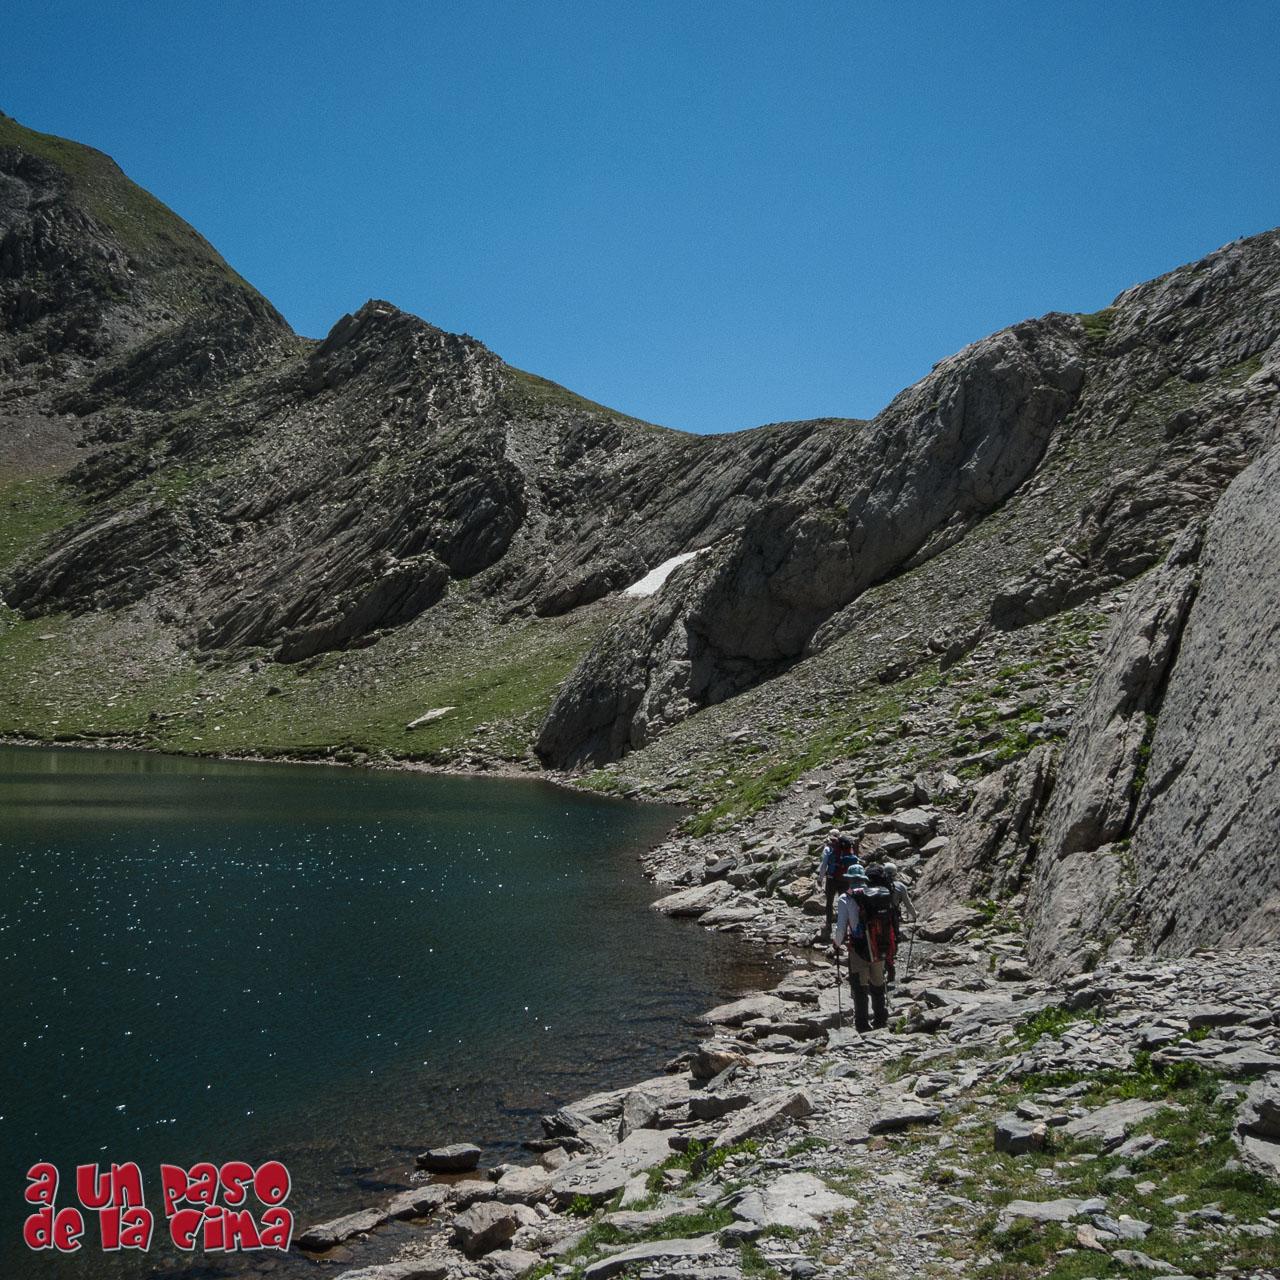 Tour du Vignemale: Bayssellance – Pico de Bernatuara – Bujaruelo